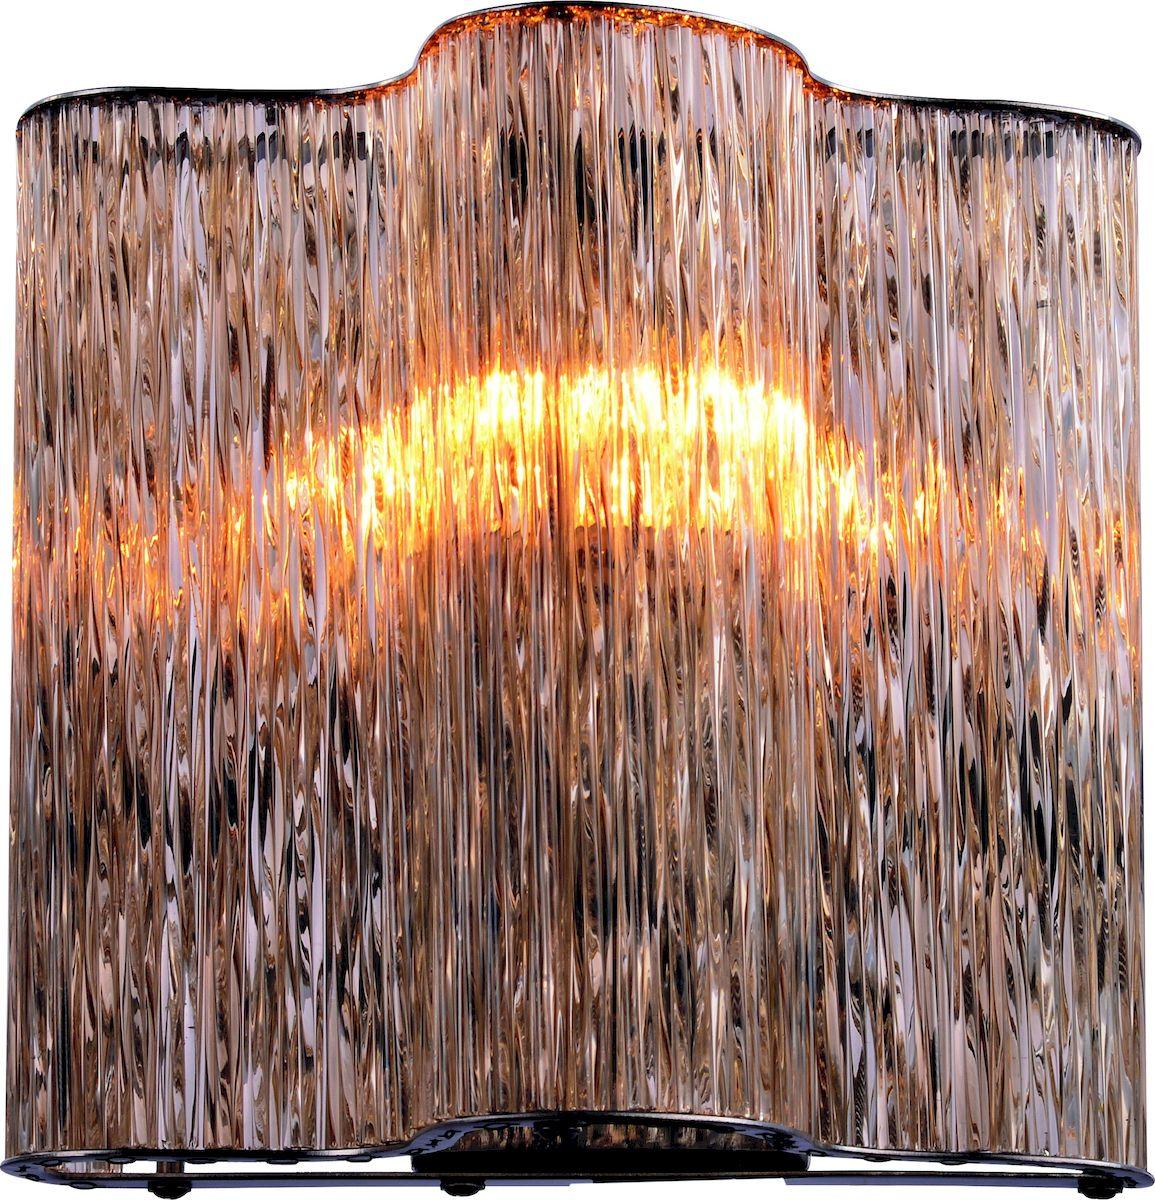 Светильник настенный Arte Lamp TWINKLE A8560AP-1CGA8560AP-1CG